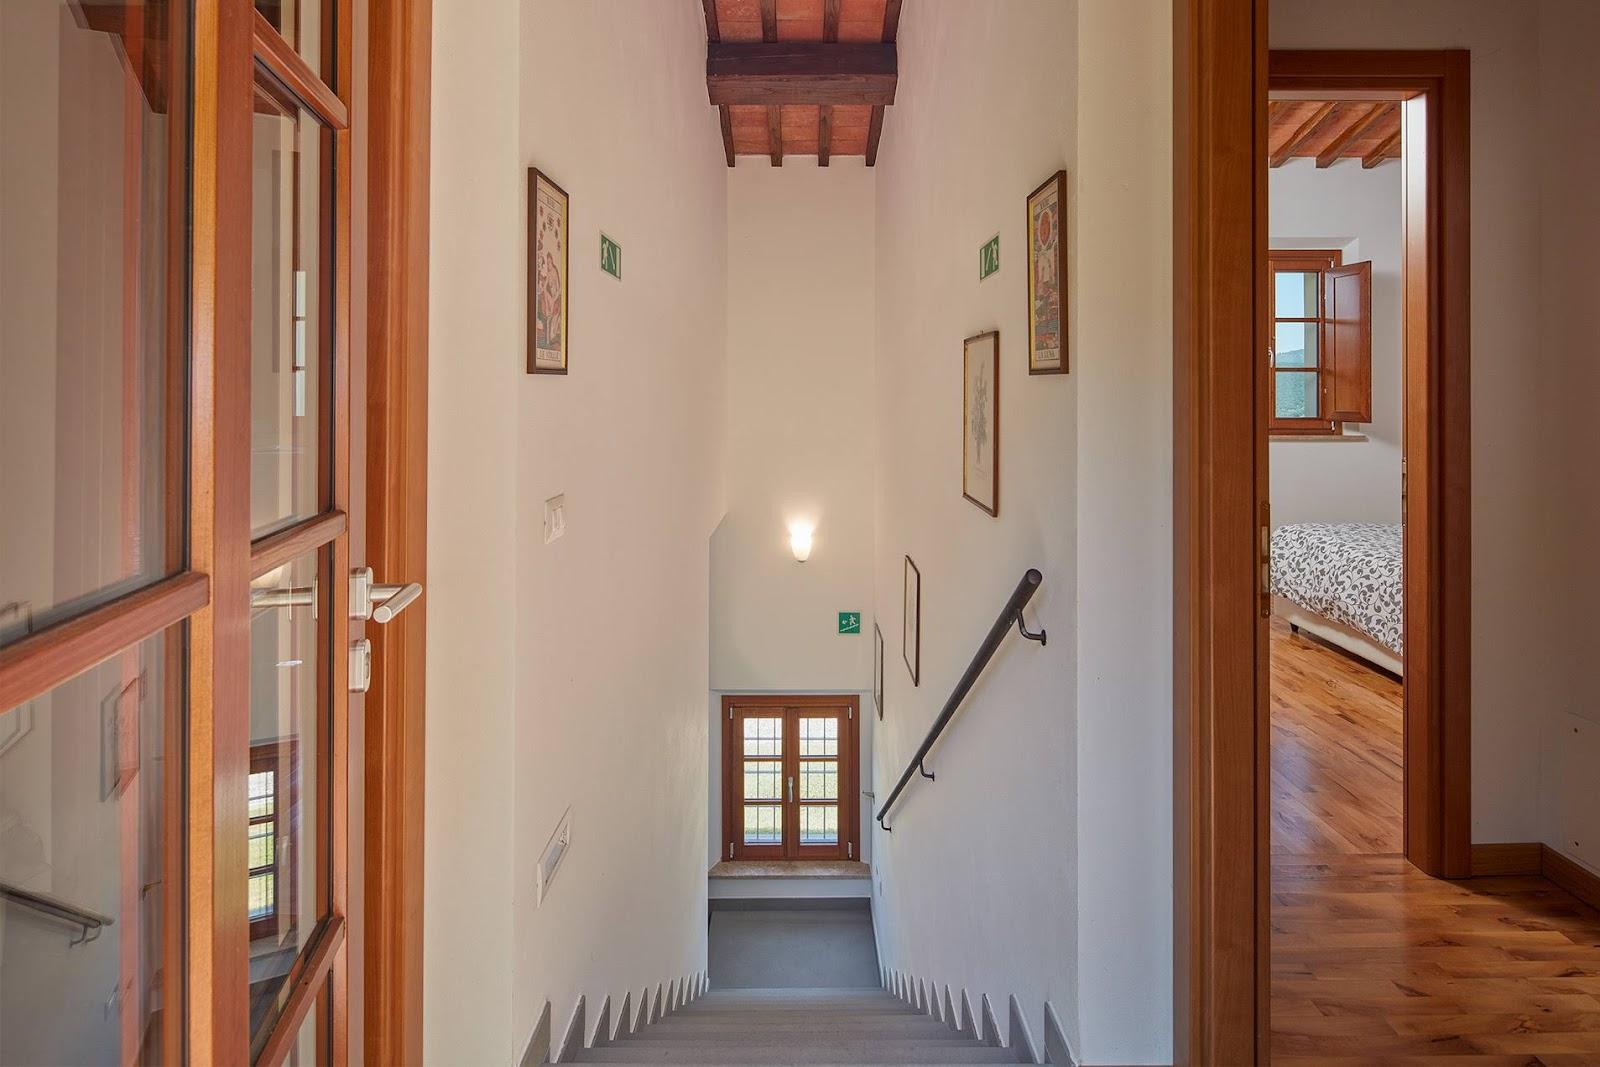 Ferienhaus Corte Paradiso (2570342), Monsummano Terme, Pistoia, Toskana, Italien, Bild 30